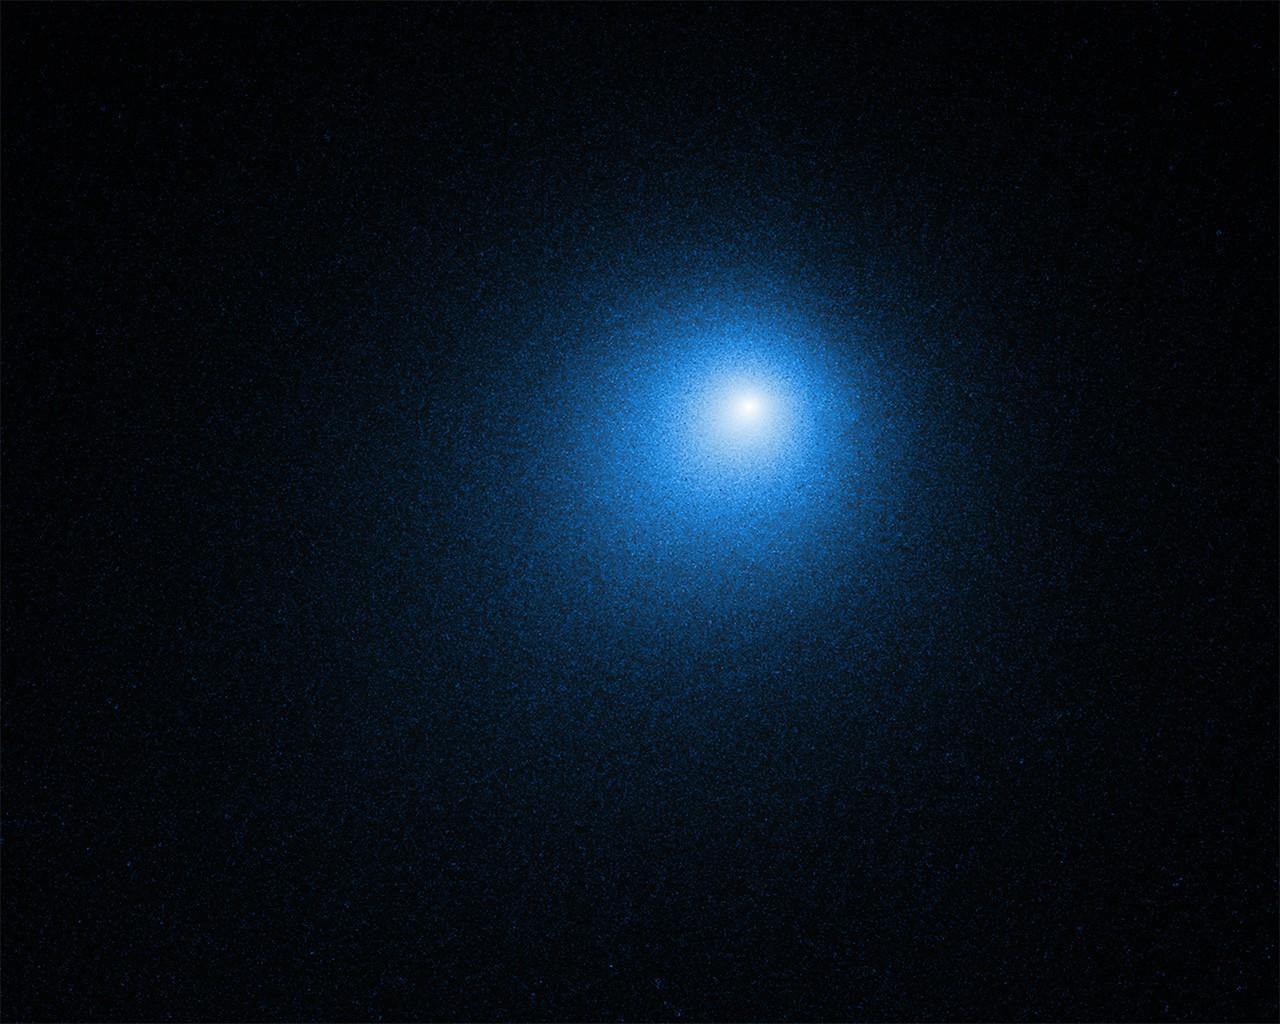 Hubble faz registro do cometa 46P/Wirtanen, que passou pela Terra em 2018 (Foto: NASA/Hubble)